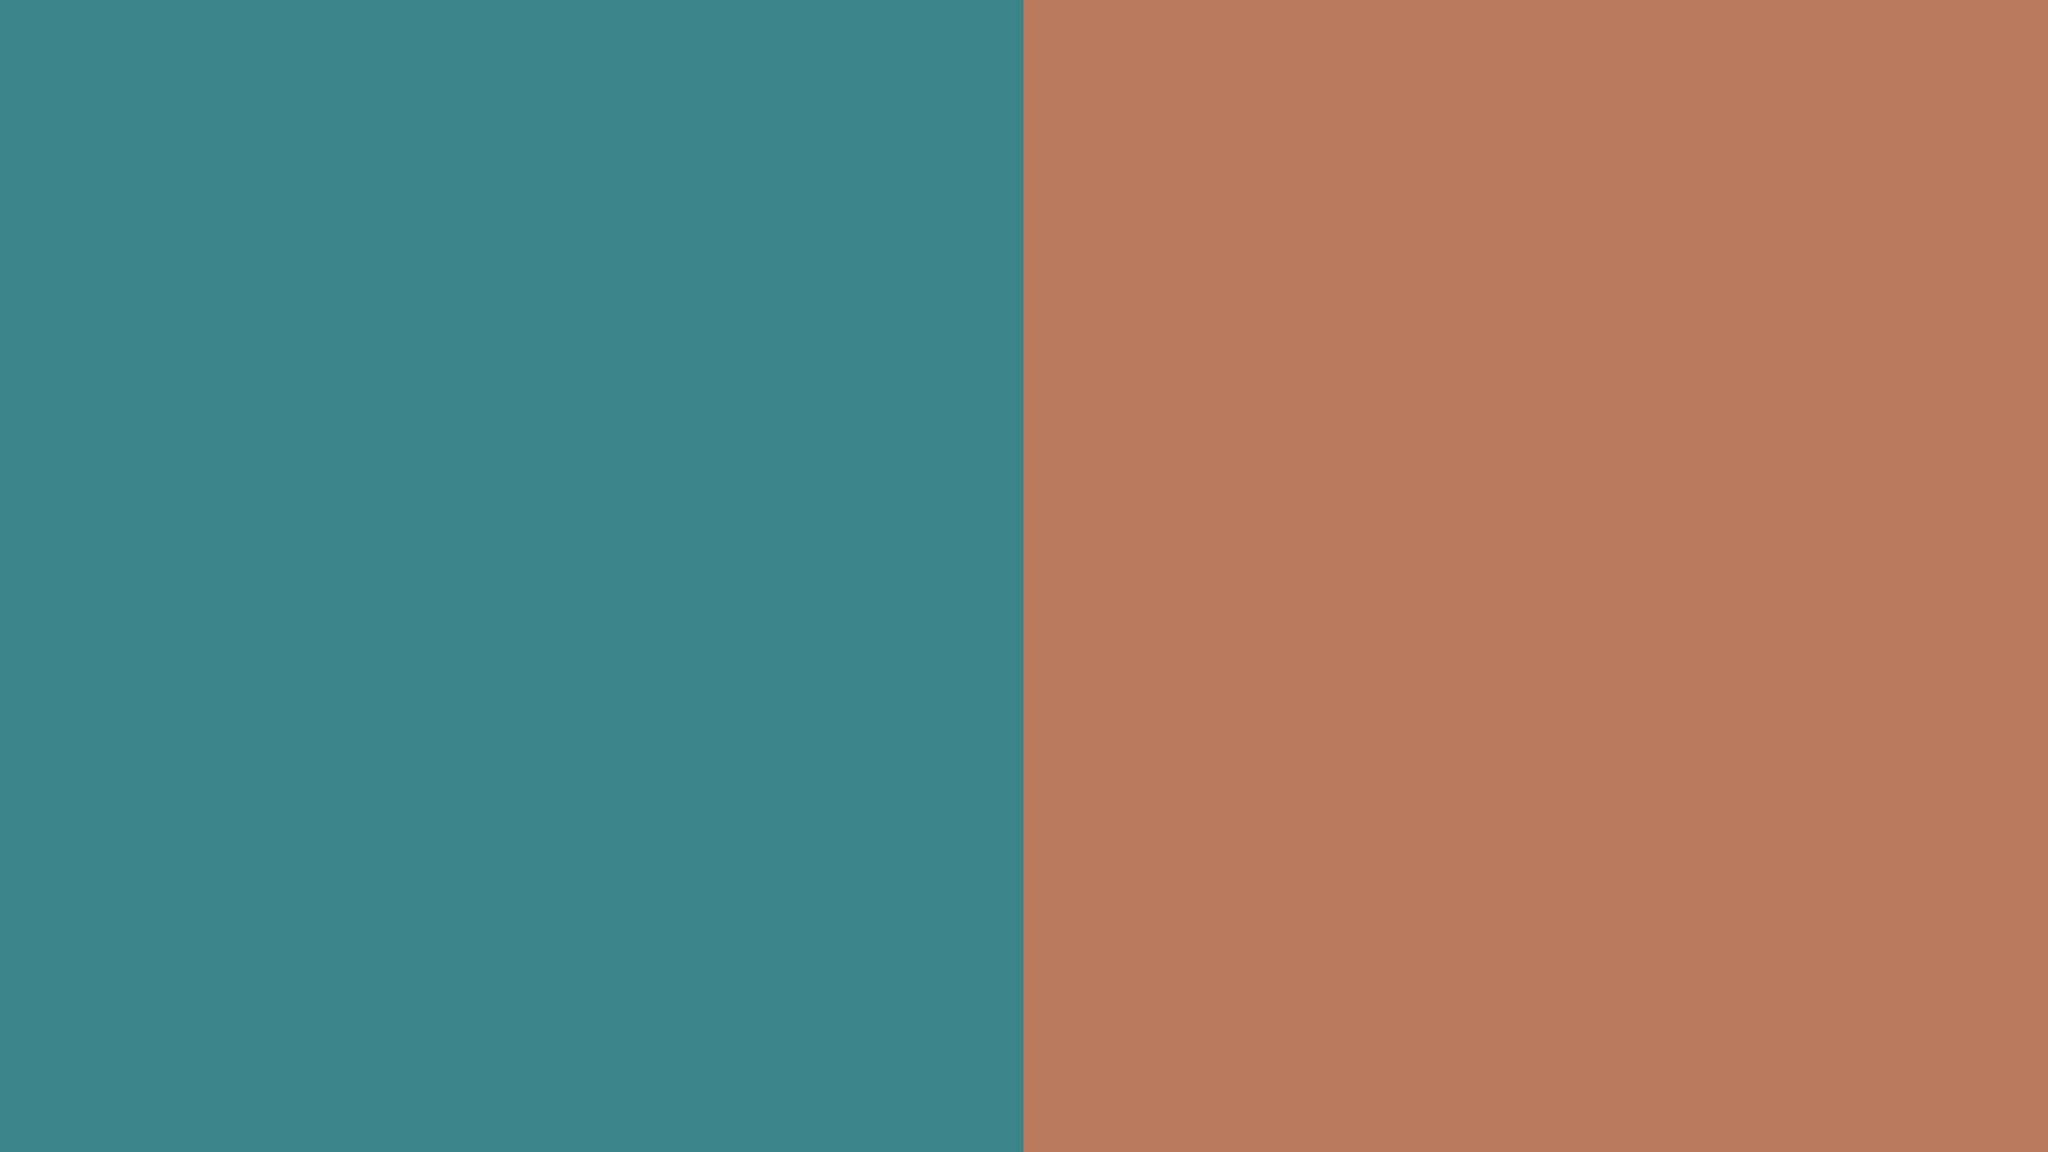 Trendfarbe: ic139, ic138